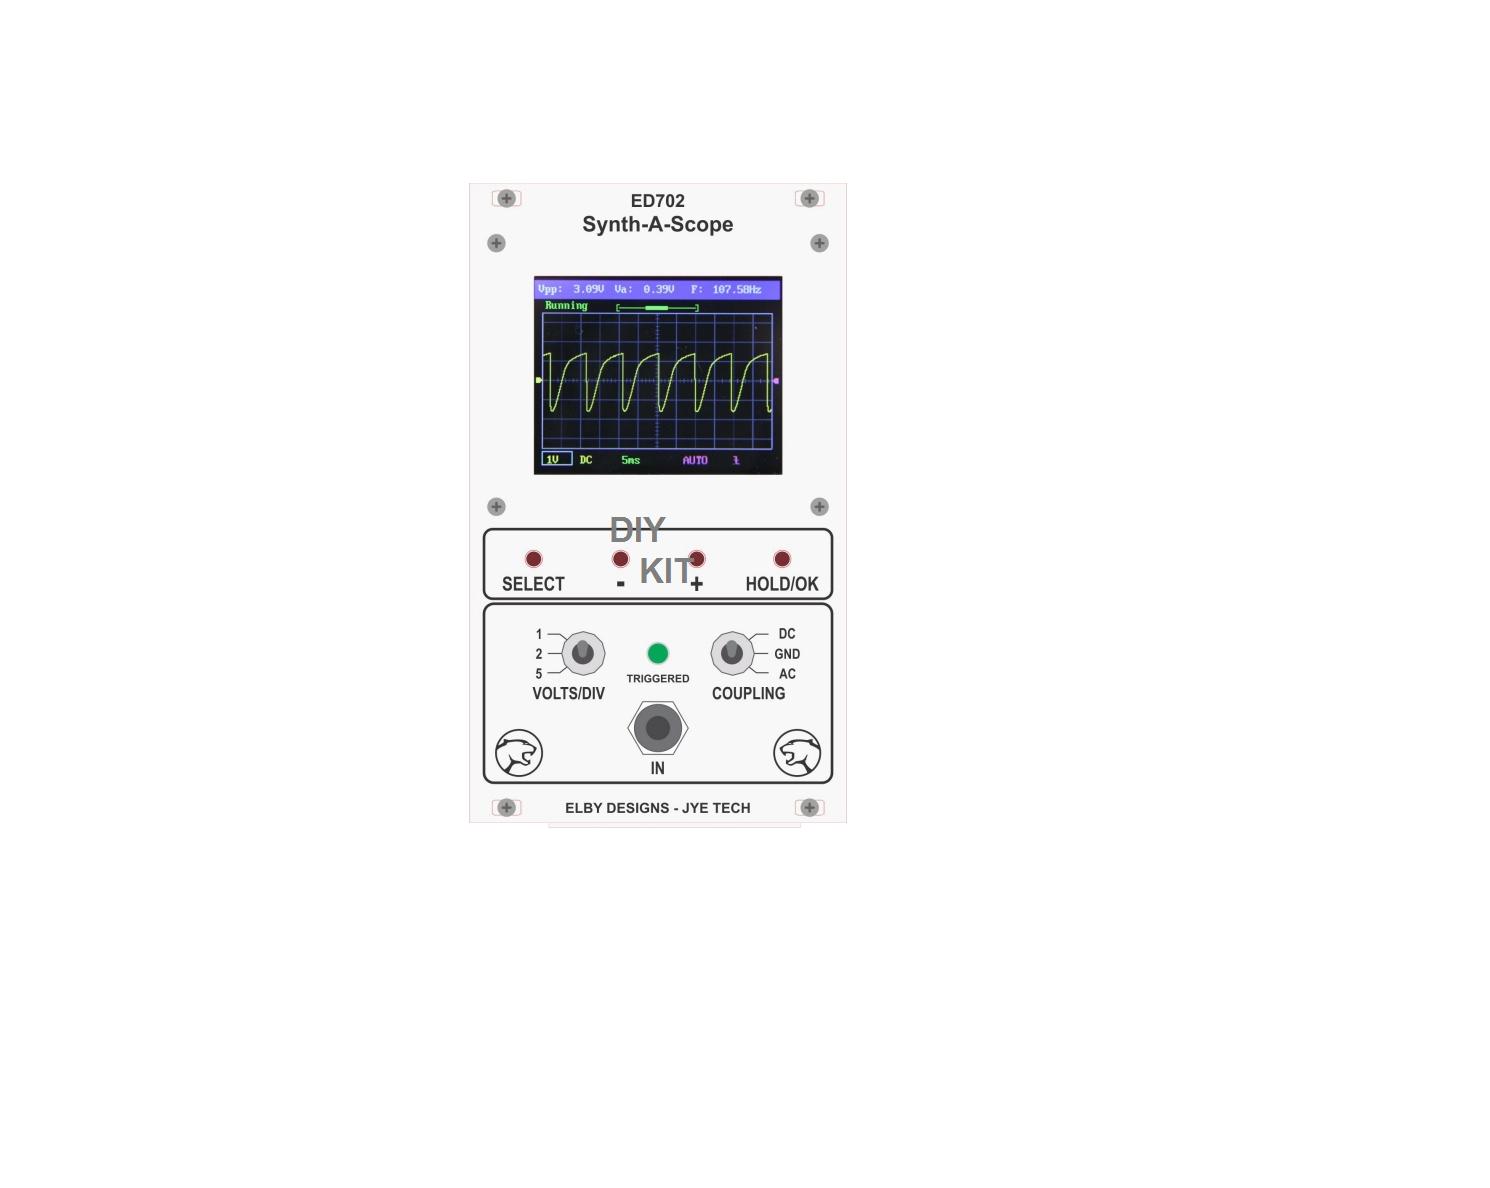 ELBY-DESIGNS ED702 SYNTH-A-SCOPE LCD OSCILLOSCOPE EURORACK SYNTHEGrößeR DIY K IT